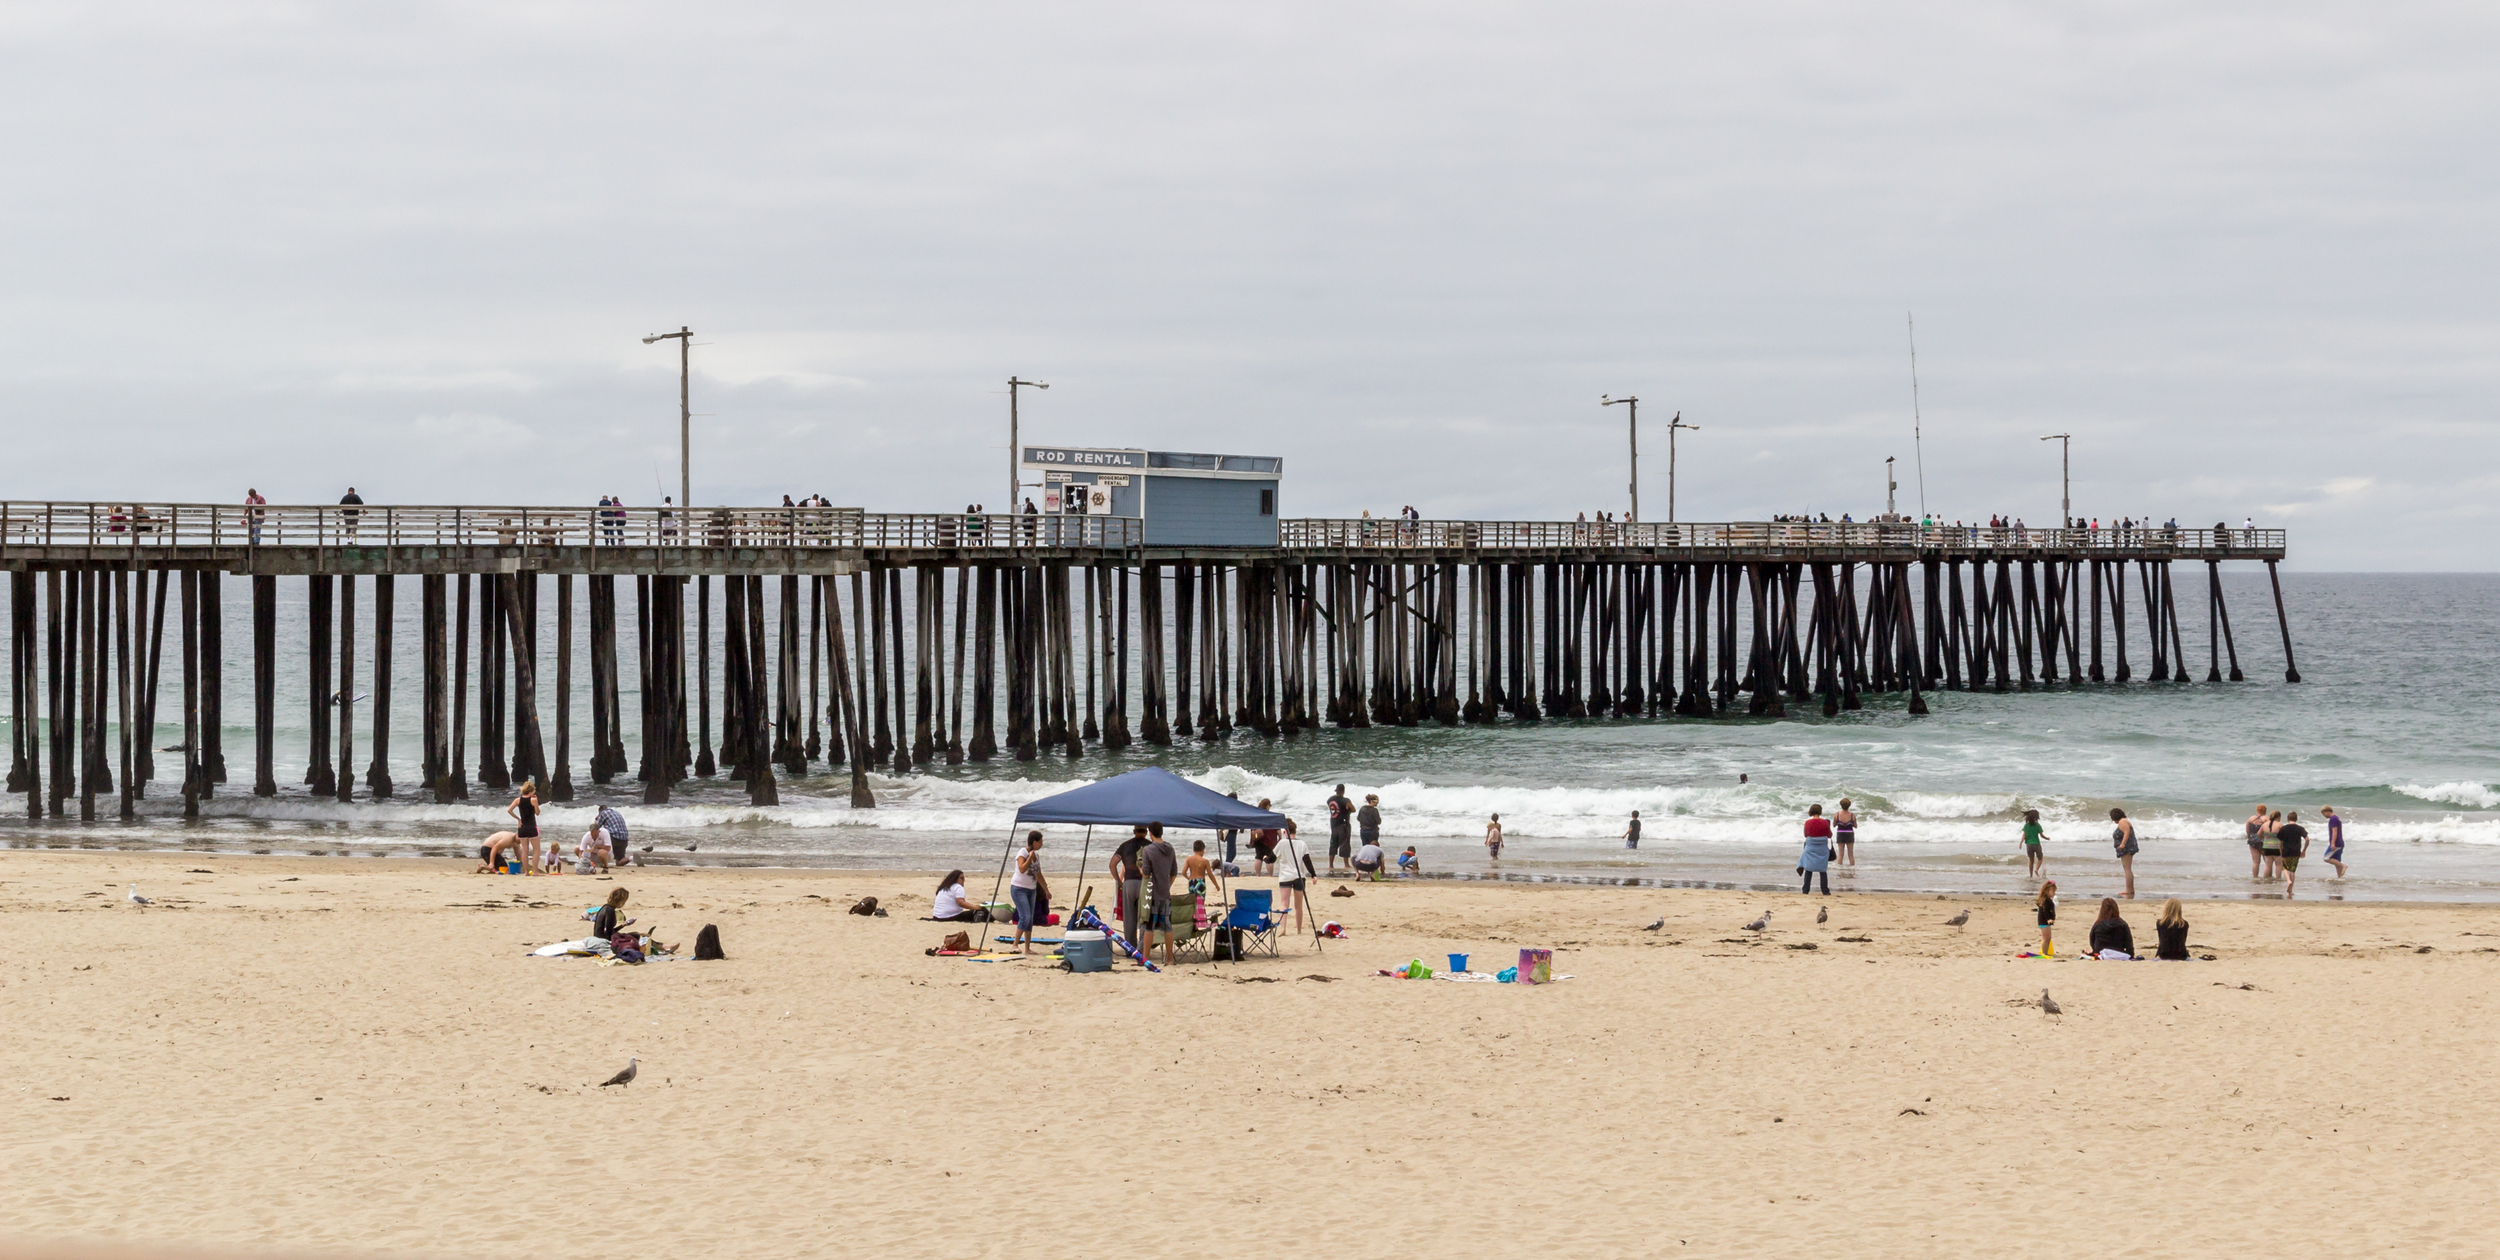 Pismo_Beach_(California,_USA),_Pier_--_2012_--_6.jpg